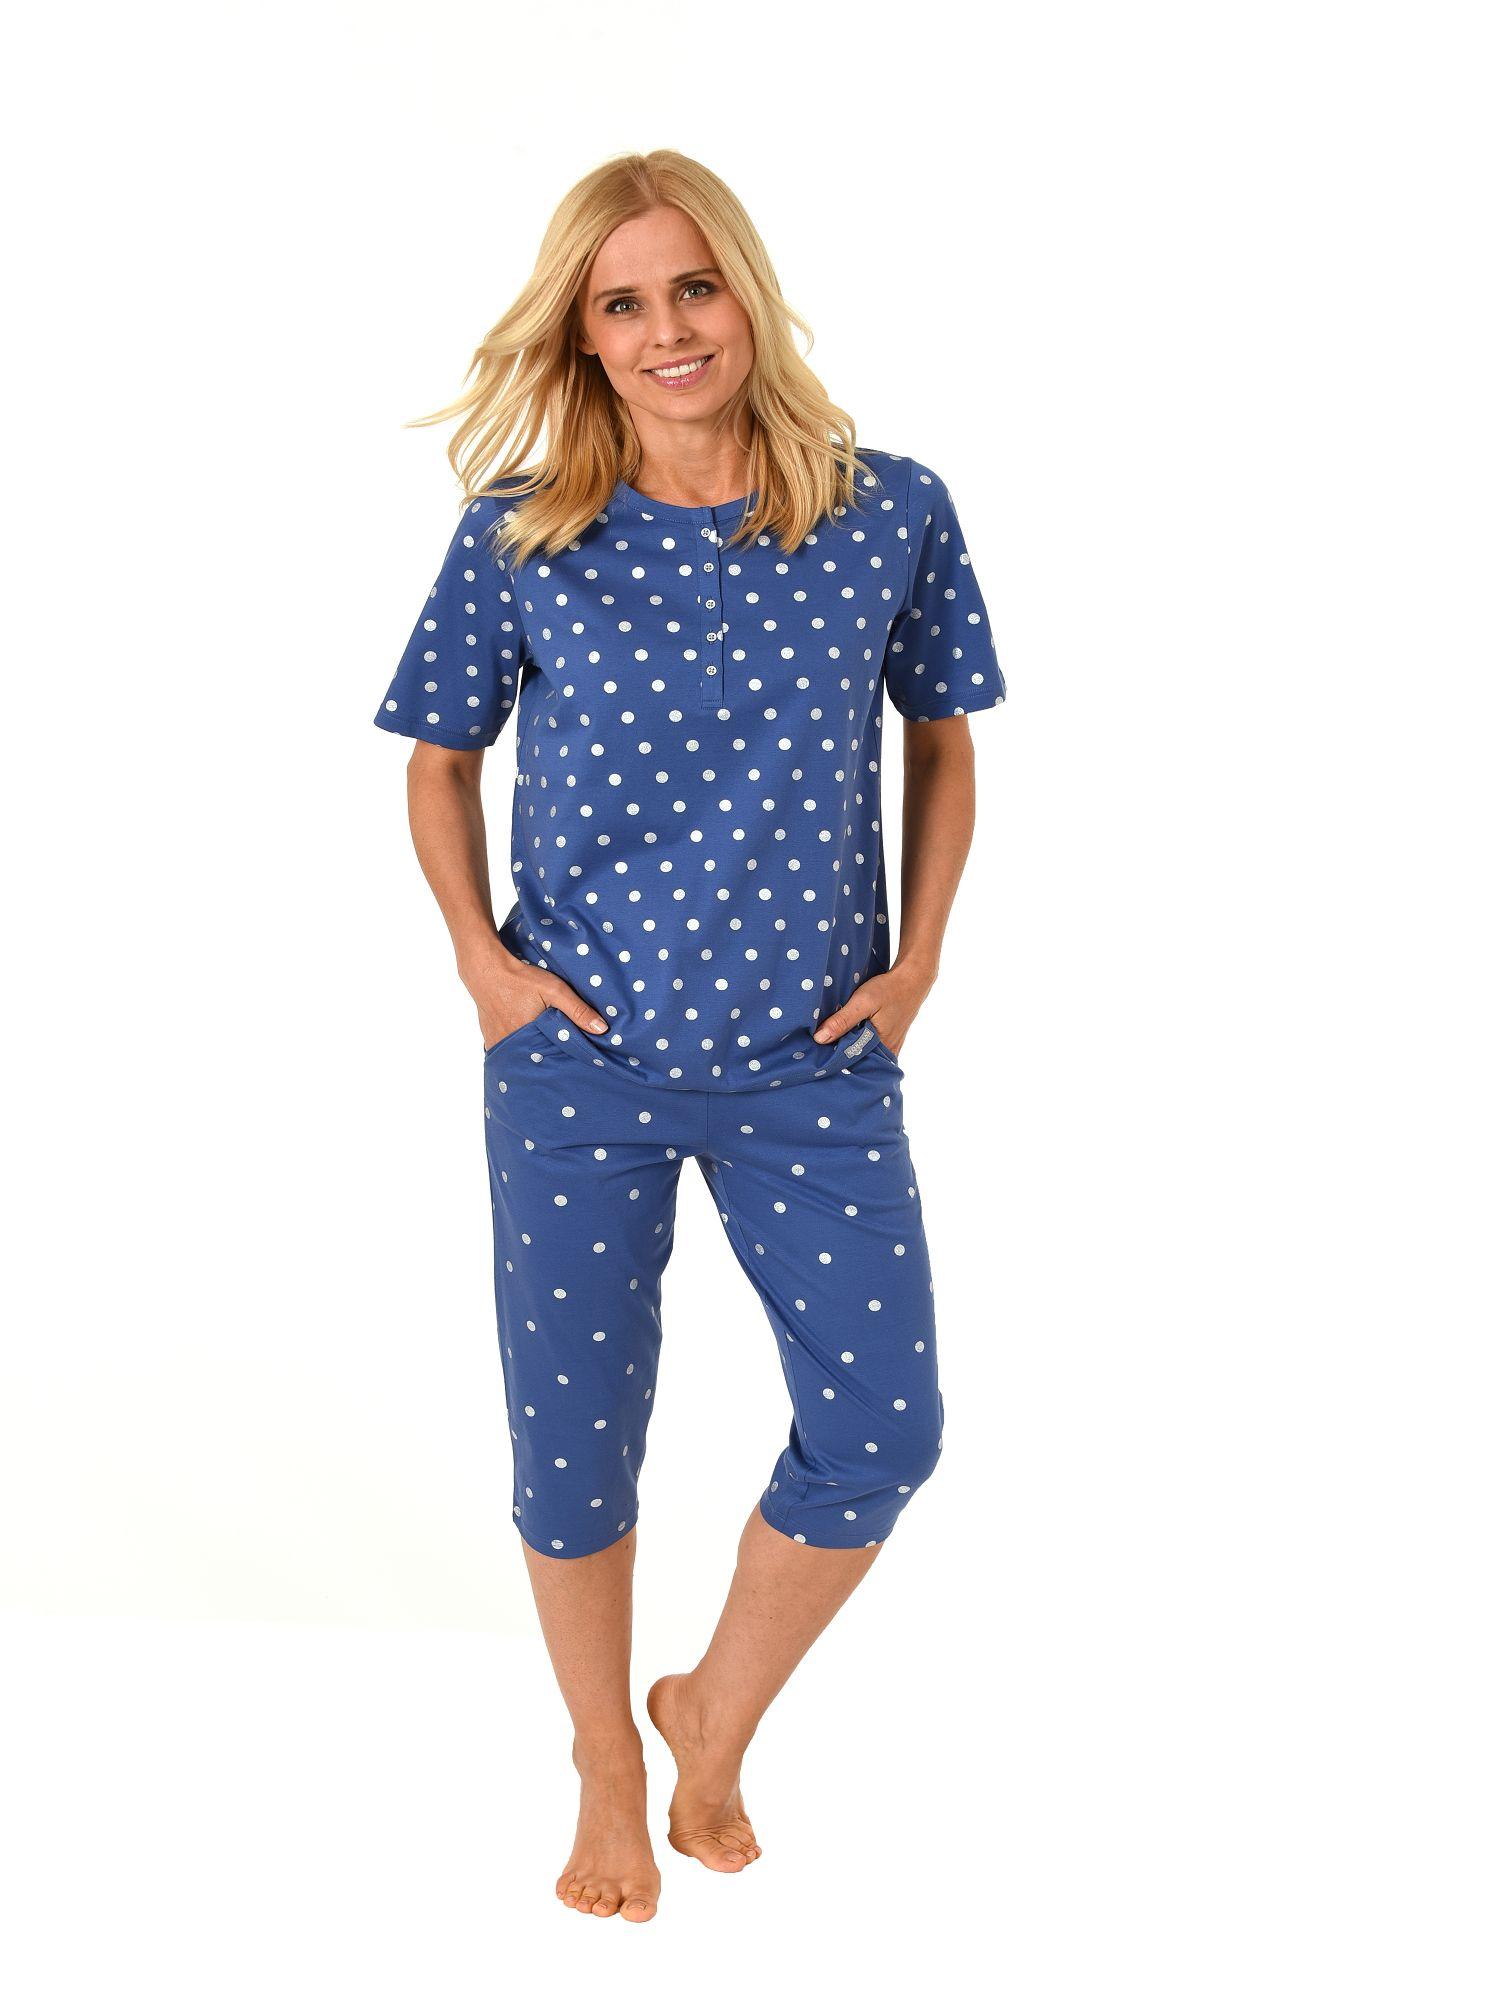 Damen Capri Pyjama 7/8-lange Hose und kurzarm Oberteil Tupfen Design 181 204 90 102